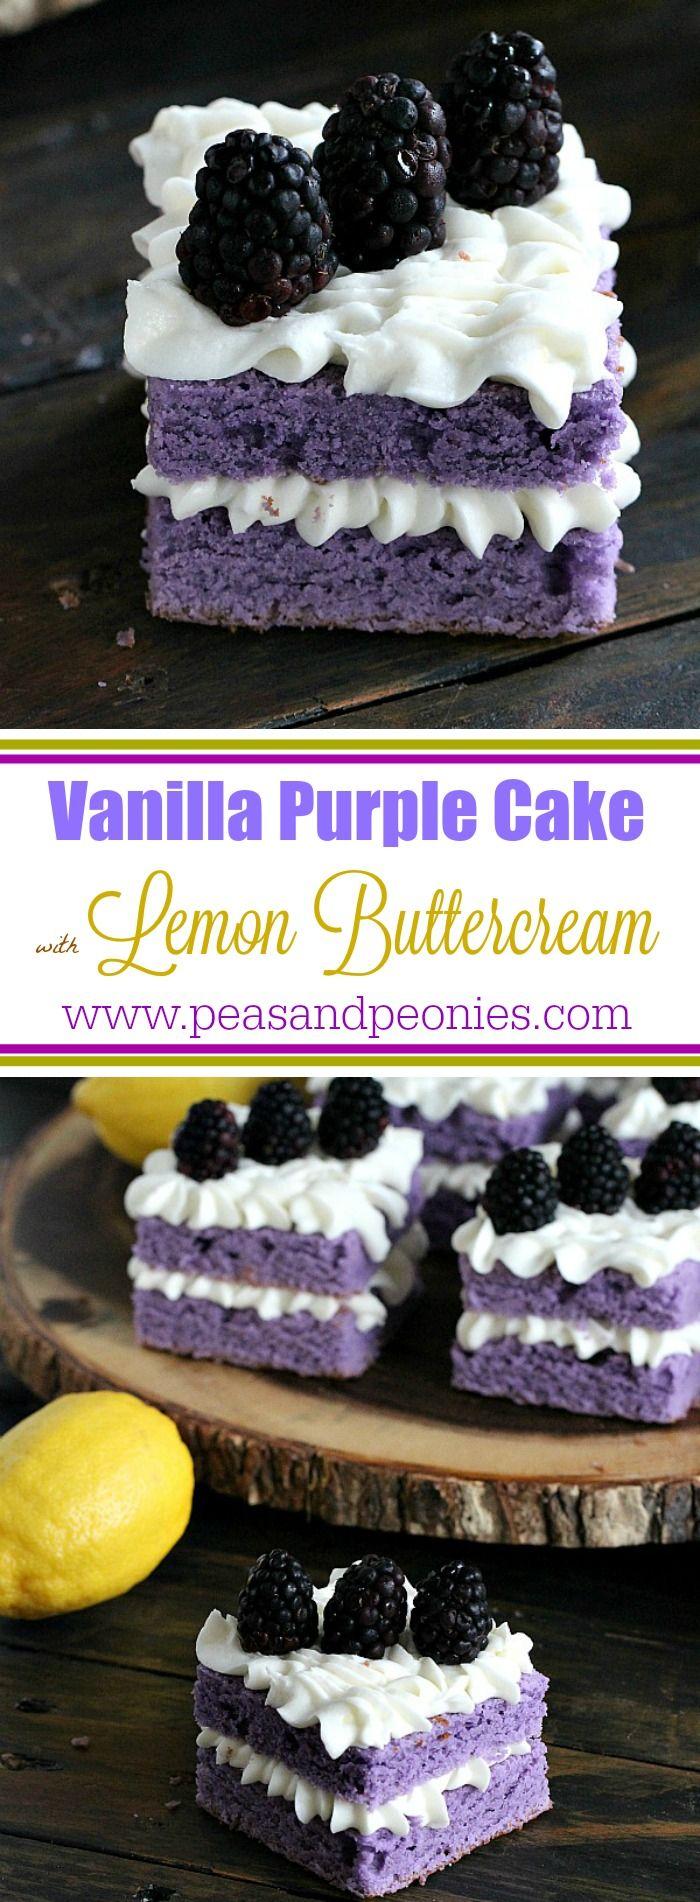 Vanilla Purple Cake with Lemon Buttercream - Peas and Peonies